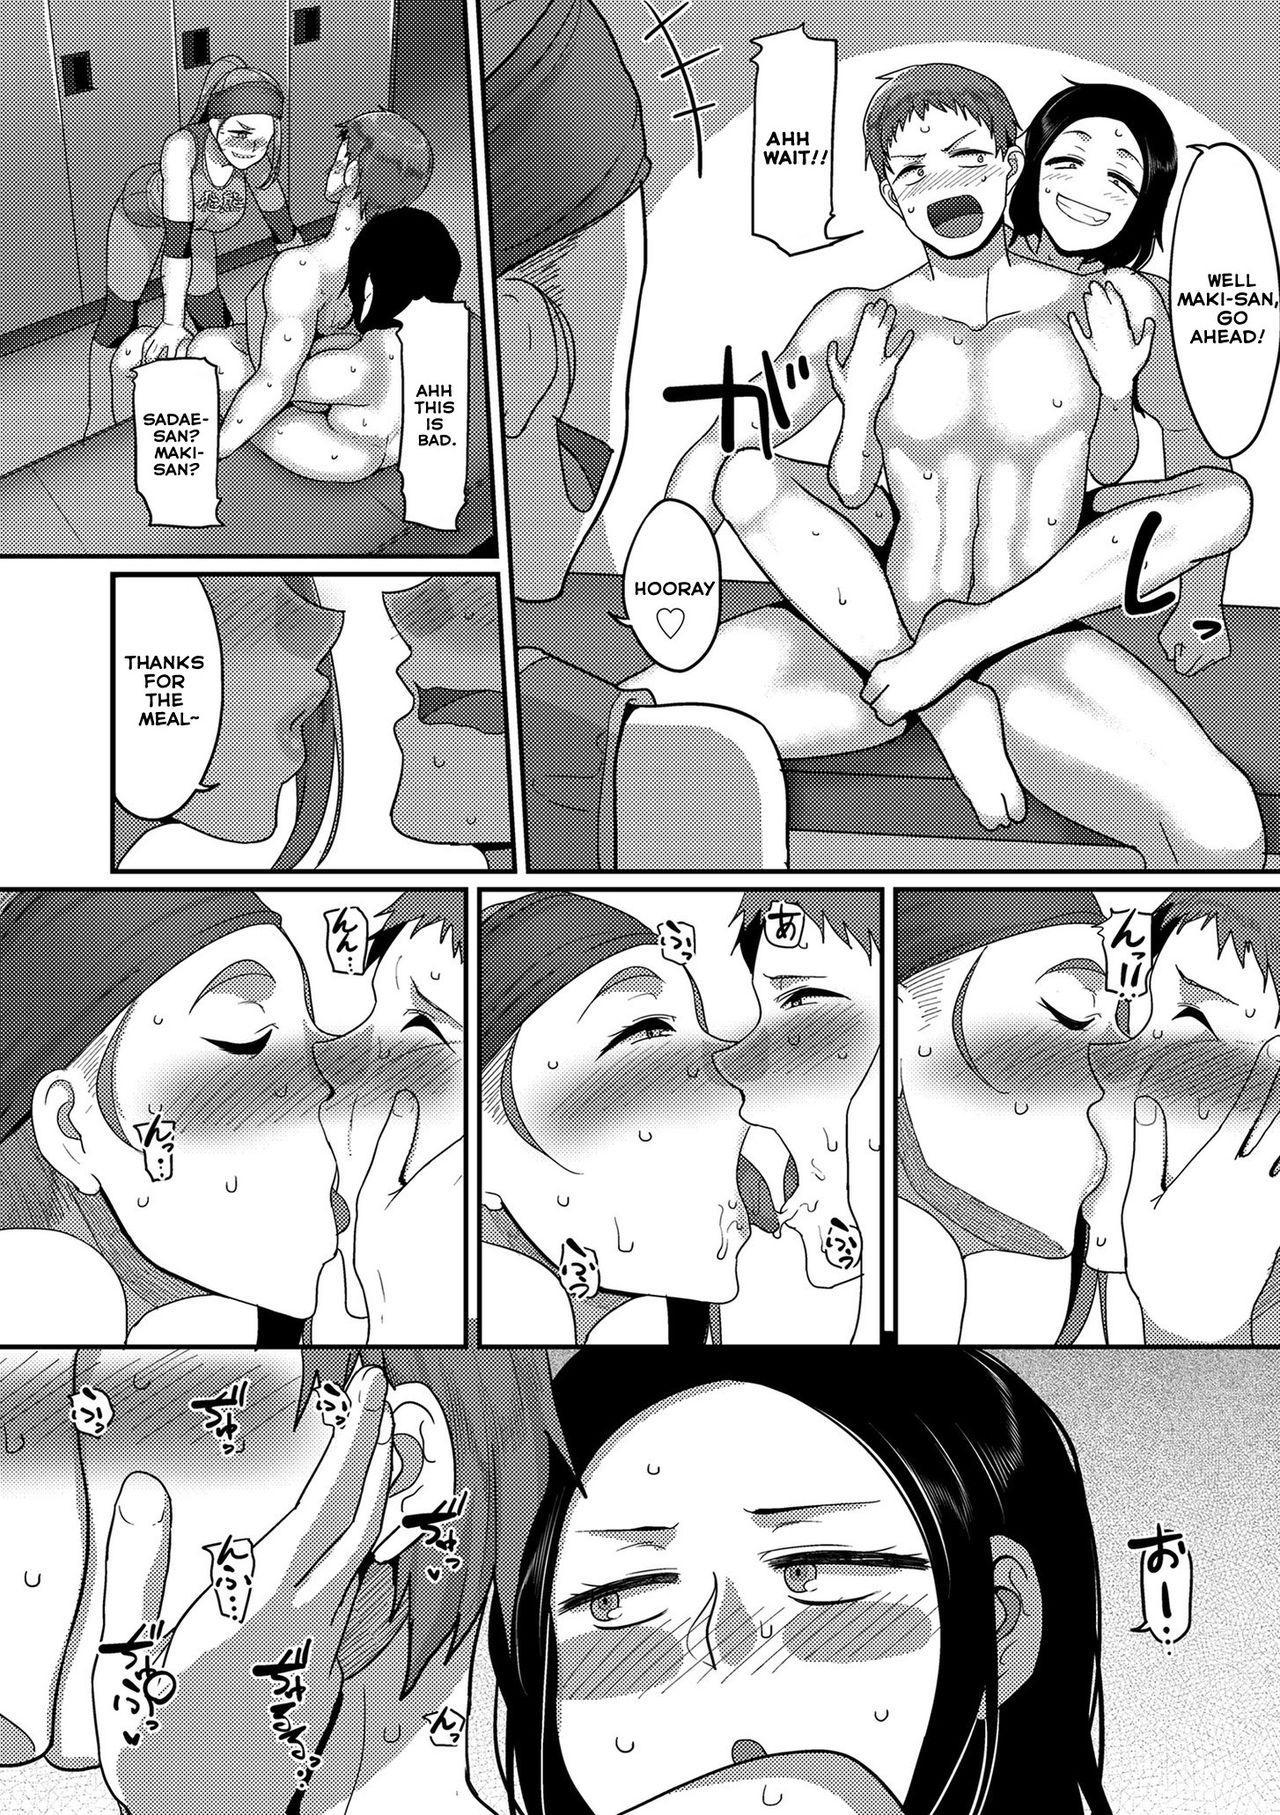 [Yamamoto Zenzen] S-ken K-shi Shakaijin Joshi Volleyball Circle no Jijou | Affairs of the Women's Volleyball Circle of K city, S prefecture 1-2 [English] [Echiisake] 29